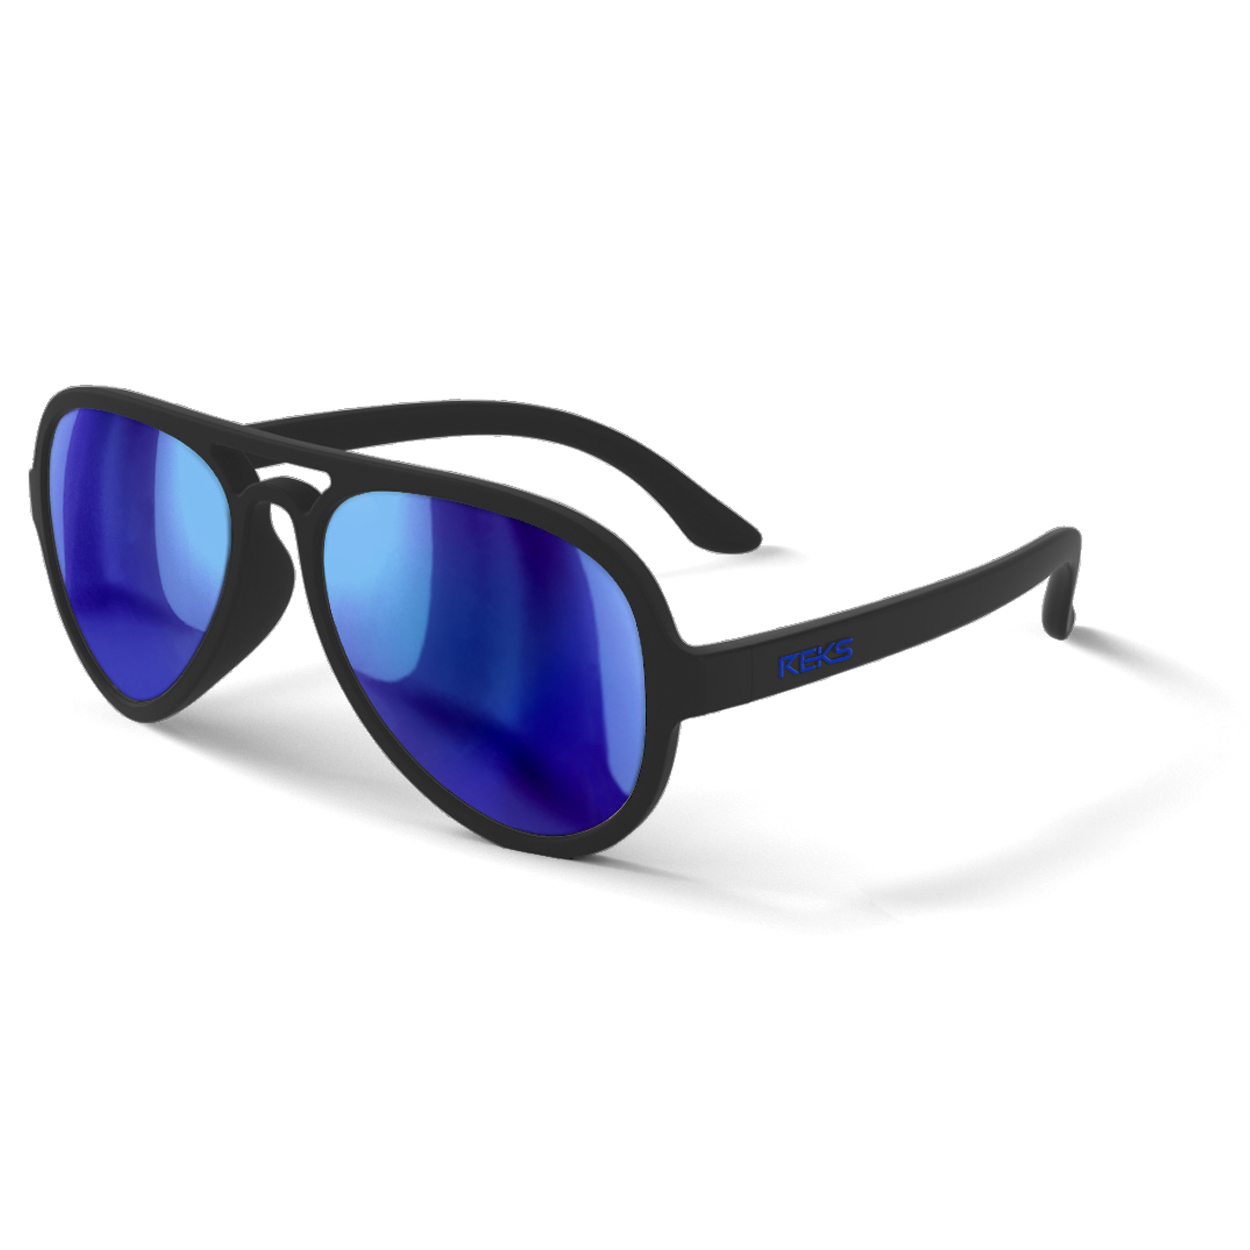 1df410bbb8a Reks Optics Aviator Golf Sunglasses